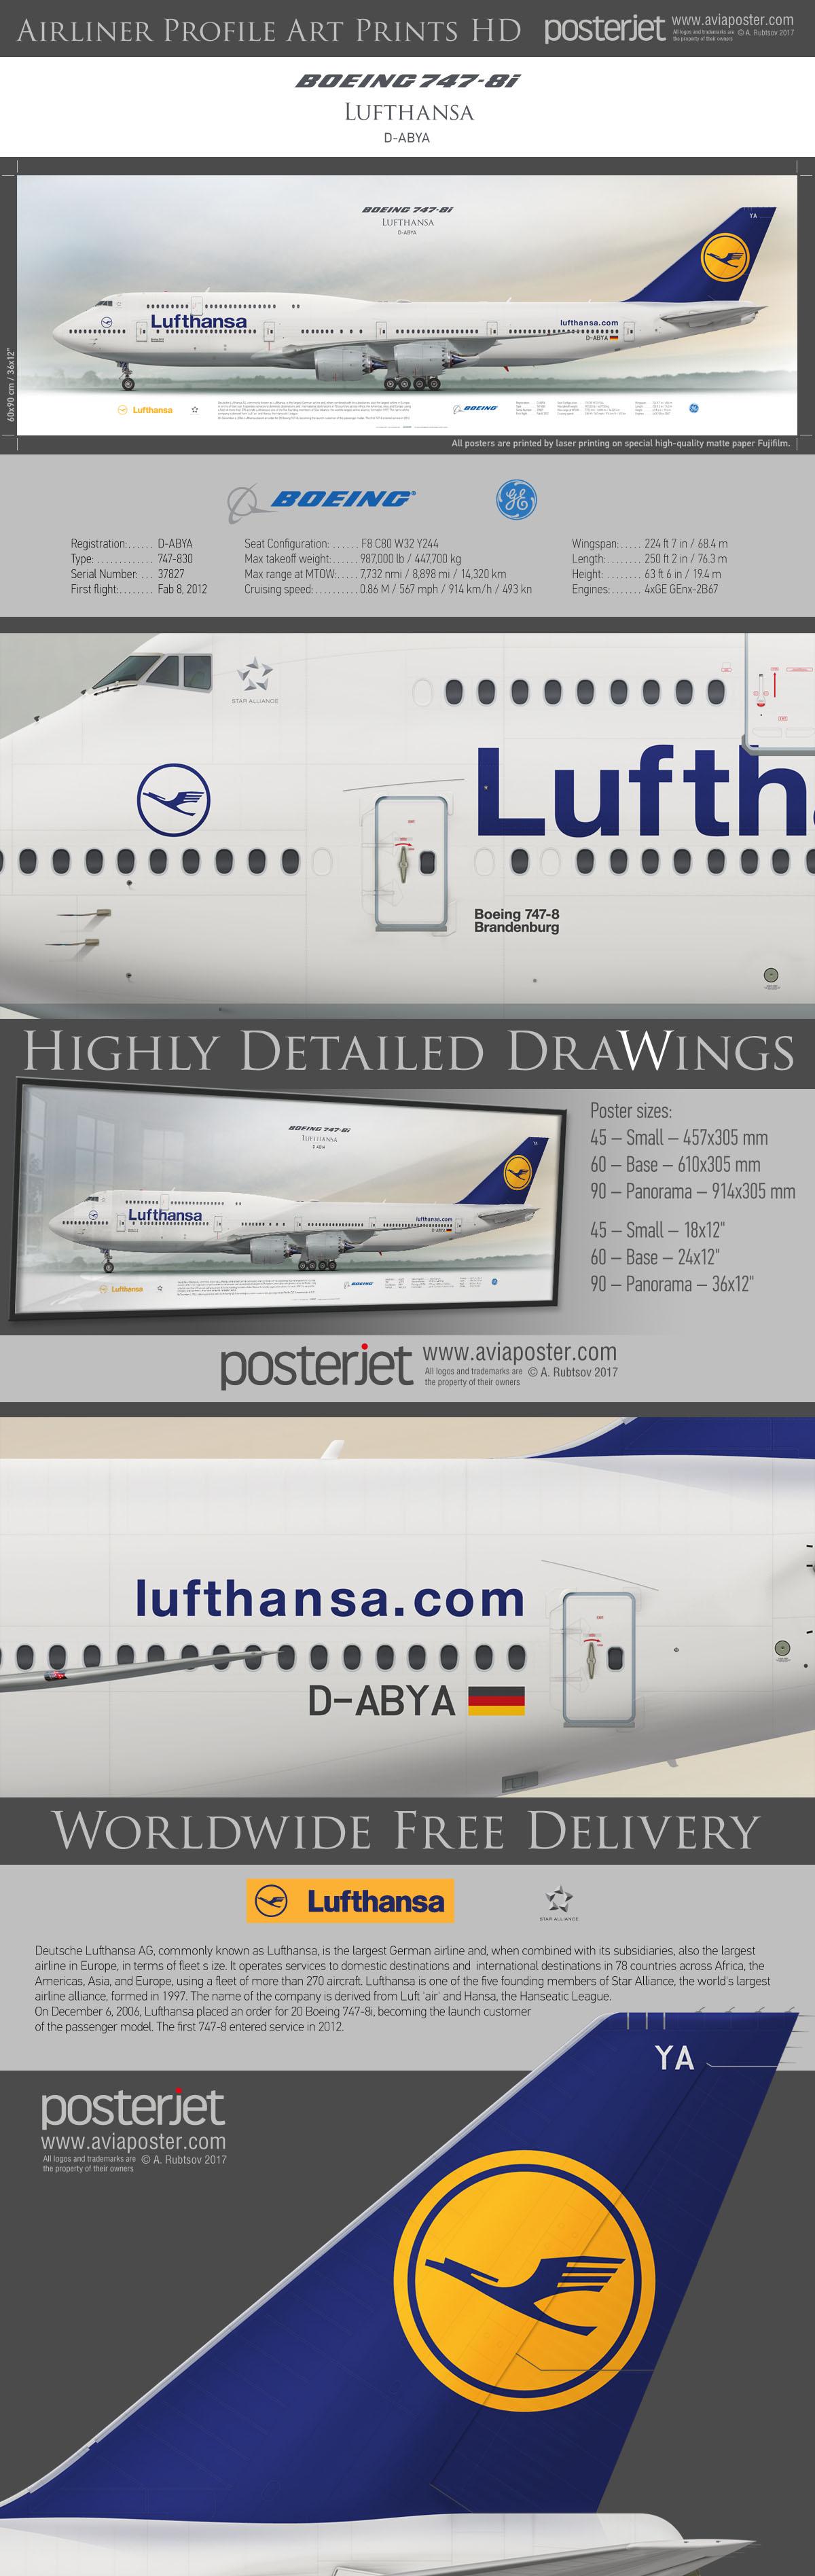 Boeing 747 8i Lufthansa D Abya Www Aviaposter Com Airliners Aviation Jetliner Airplane Pilot Aviatio Boeing Aircraft Cargo Aircraft Aviation Airplane